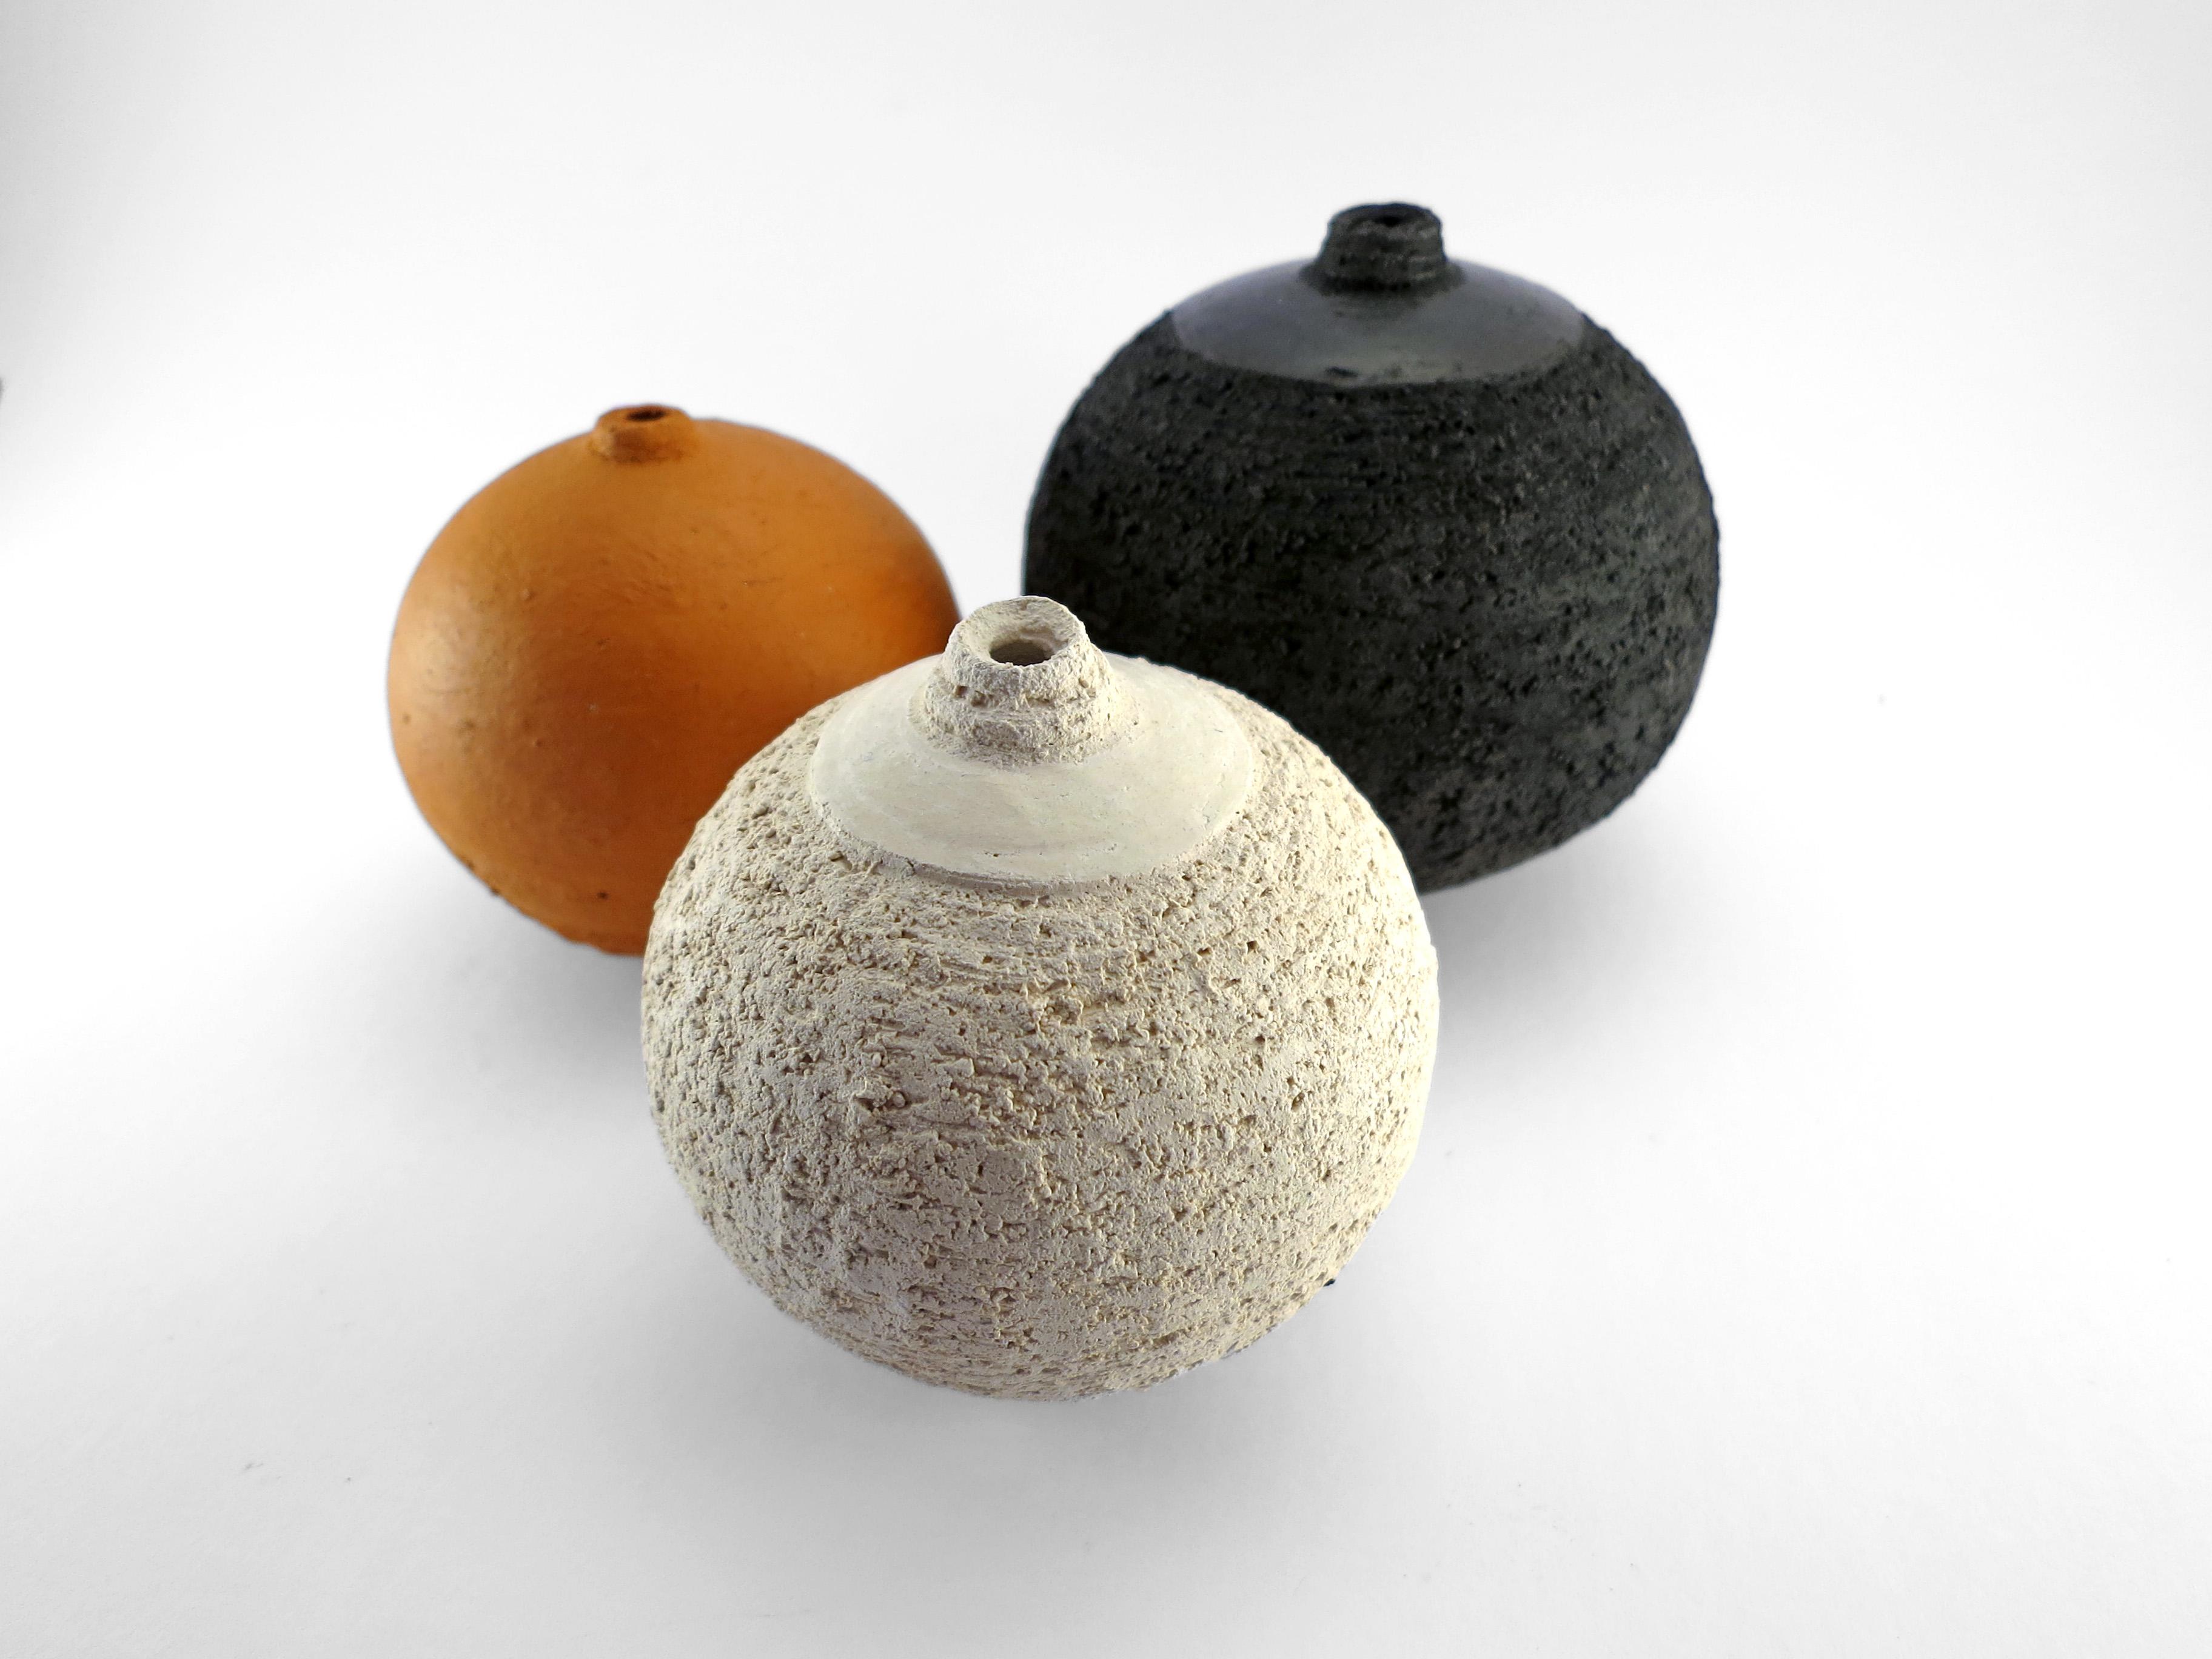 Whispering Globes from the Wild Clay Series - Ildikó Károlyi